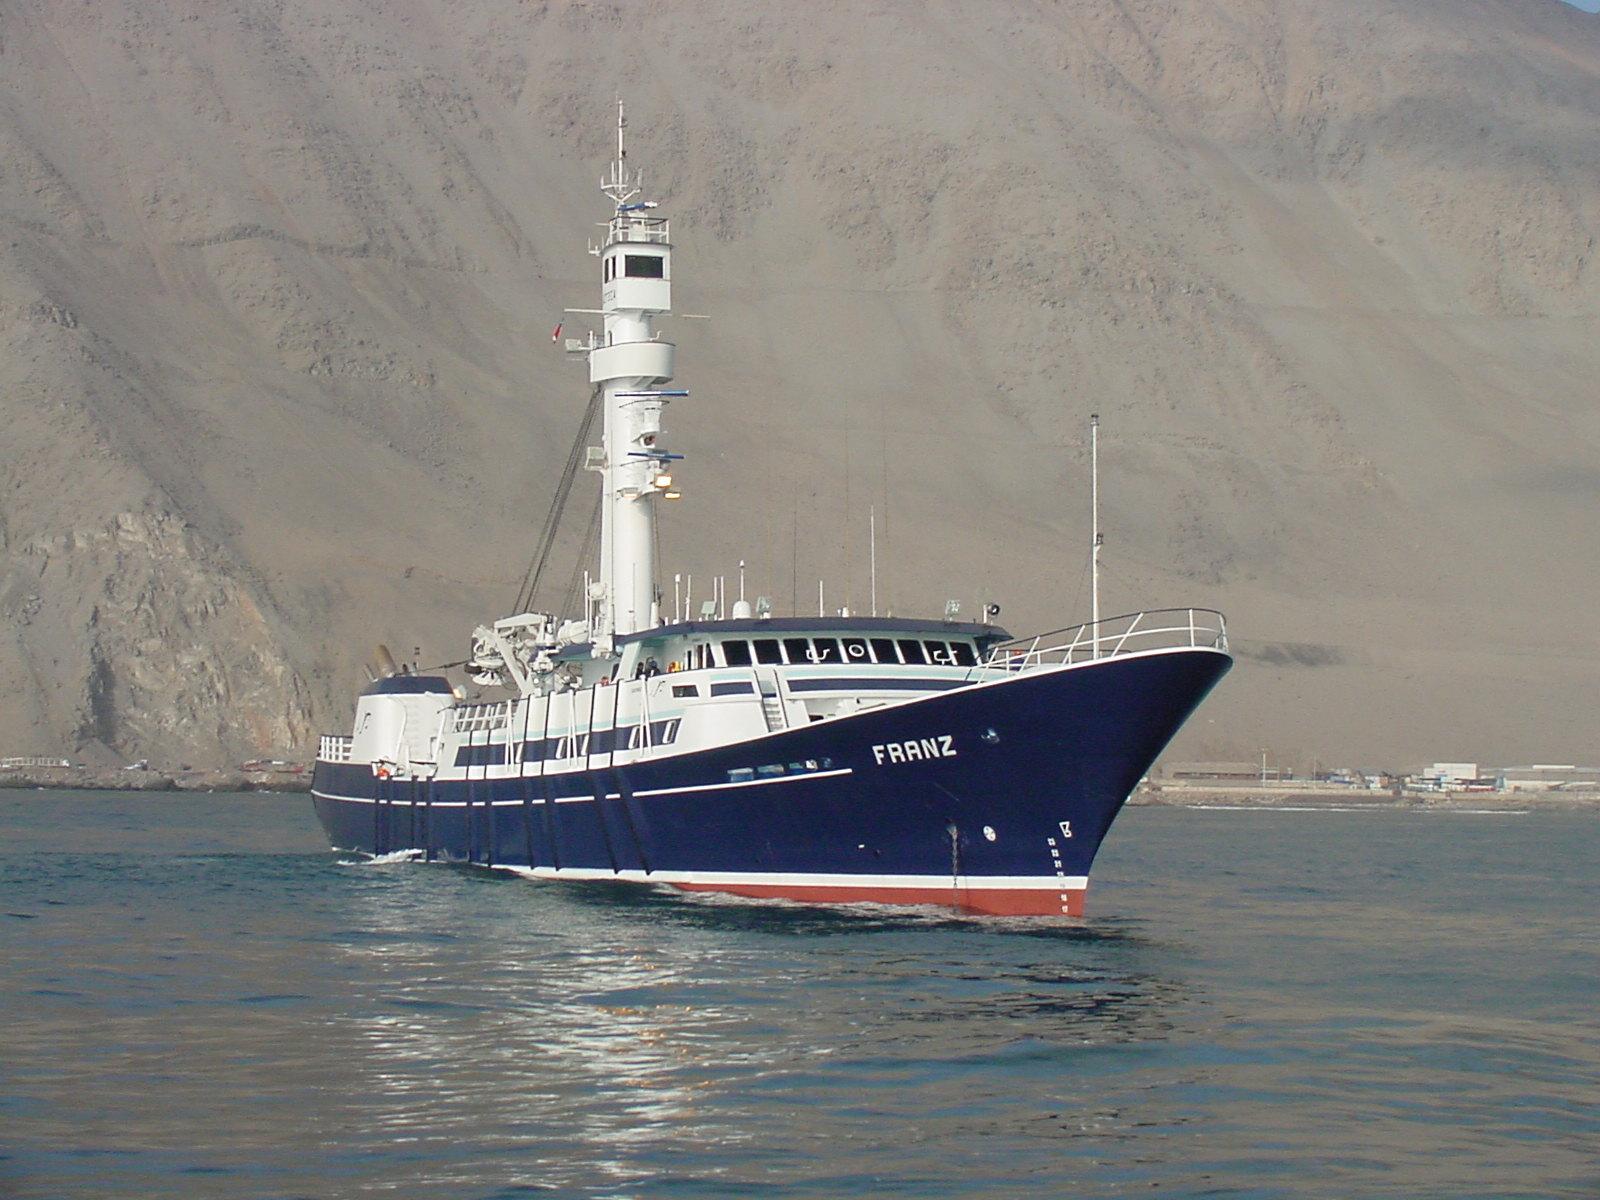 Primer atunero equipado por TH Marco en Sudamérica (Franz)